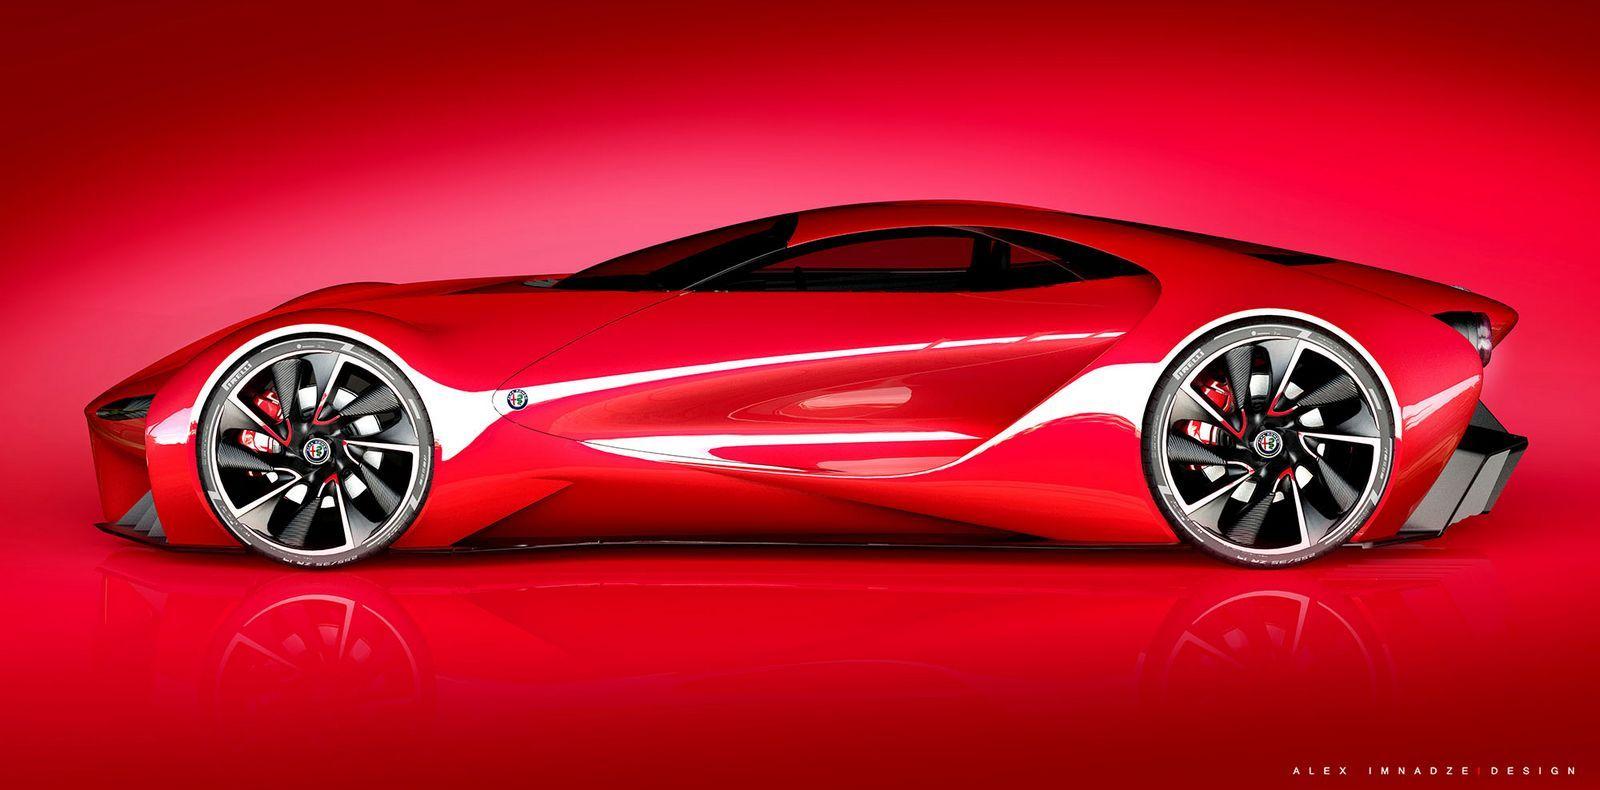 Alfa Auto Insurance >> Alfa Romeo 6c Disco Volante Design Study Is An Italian